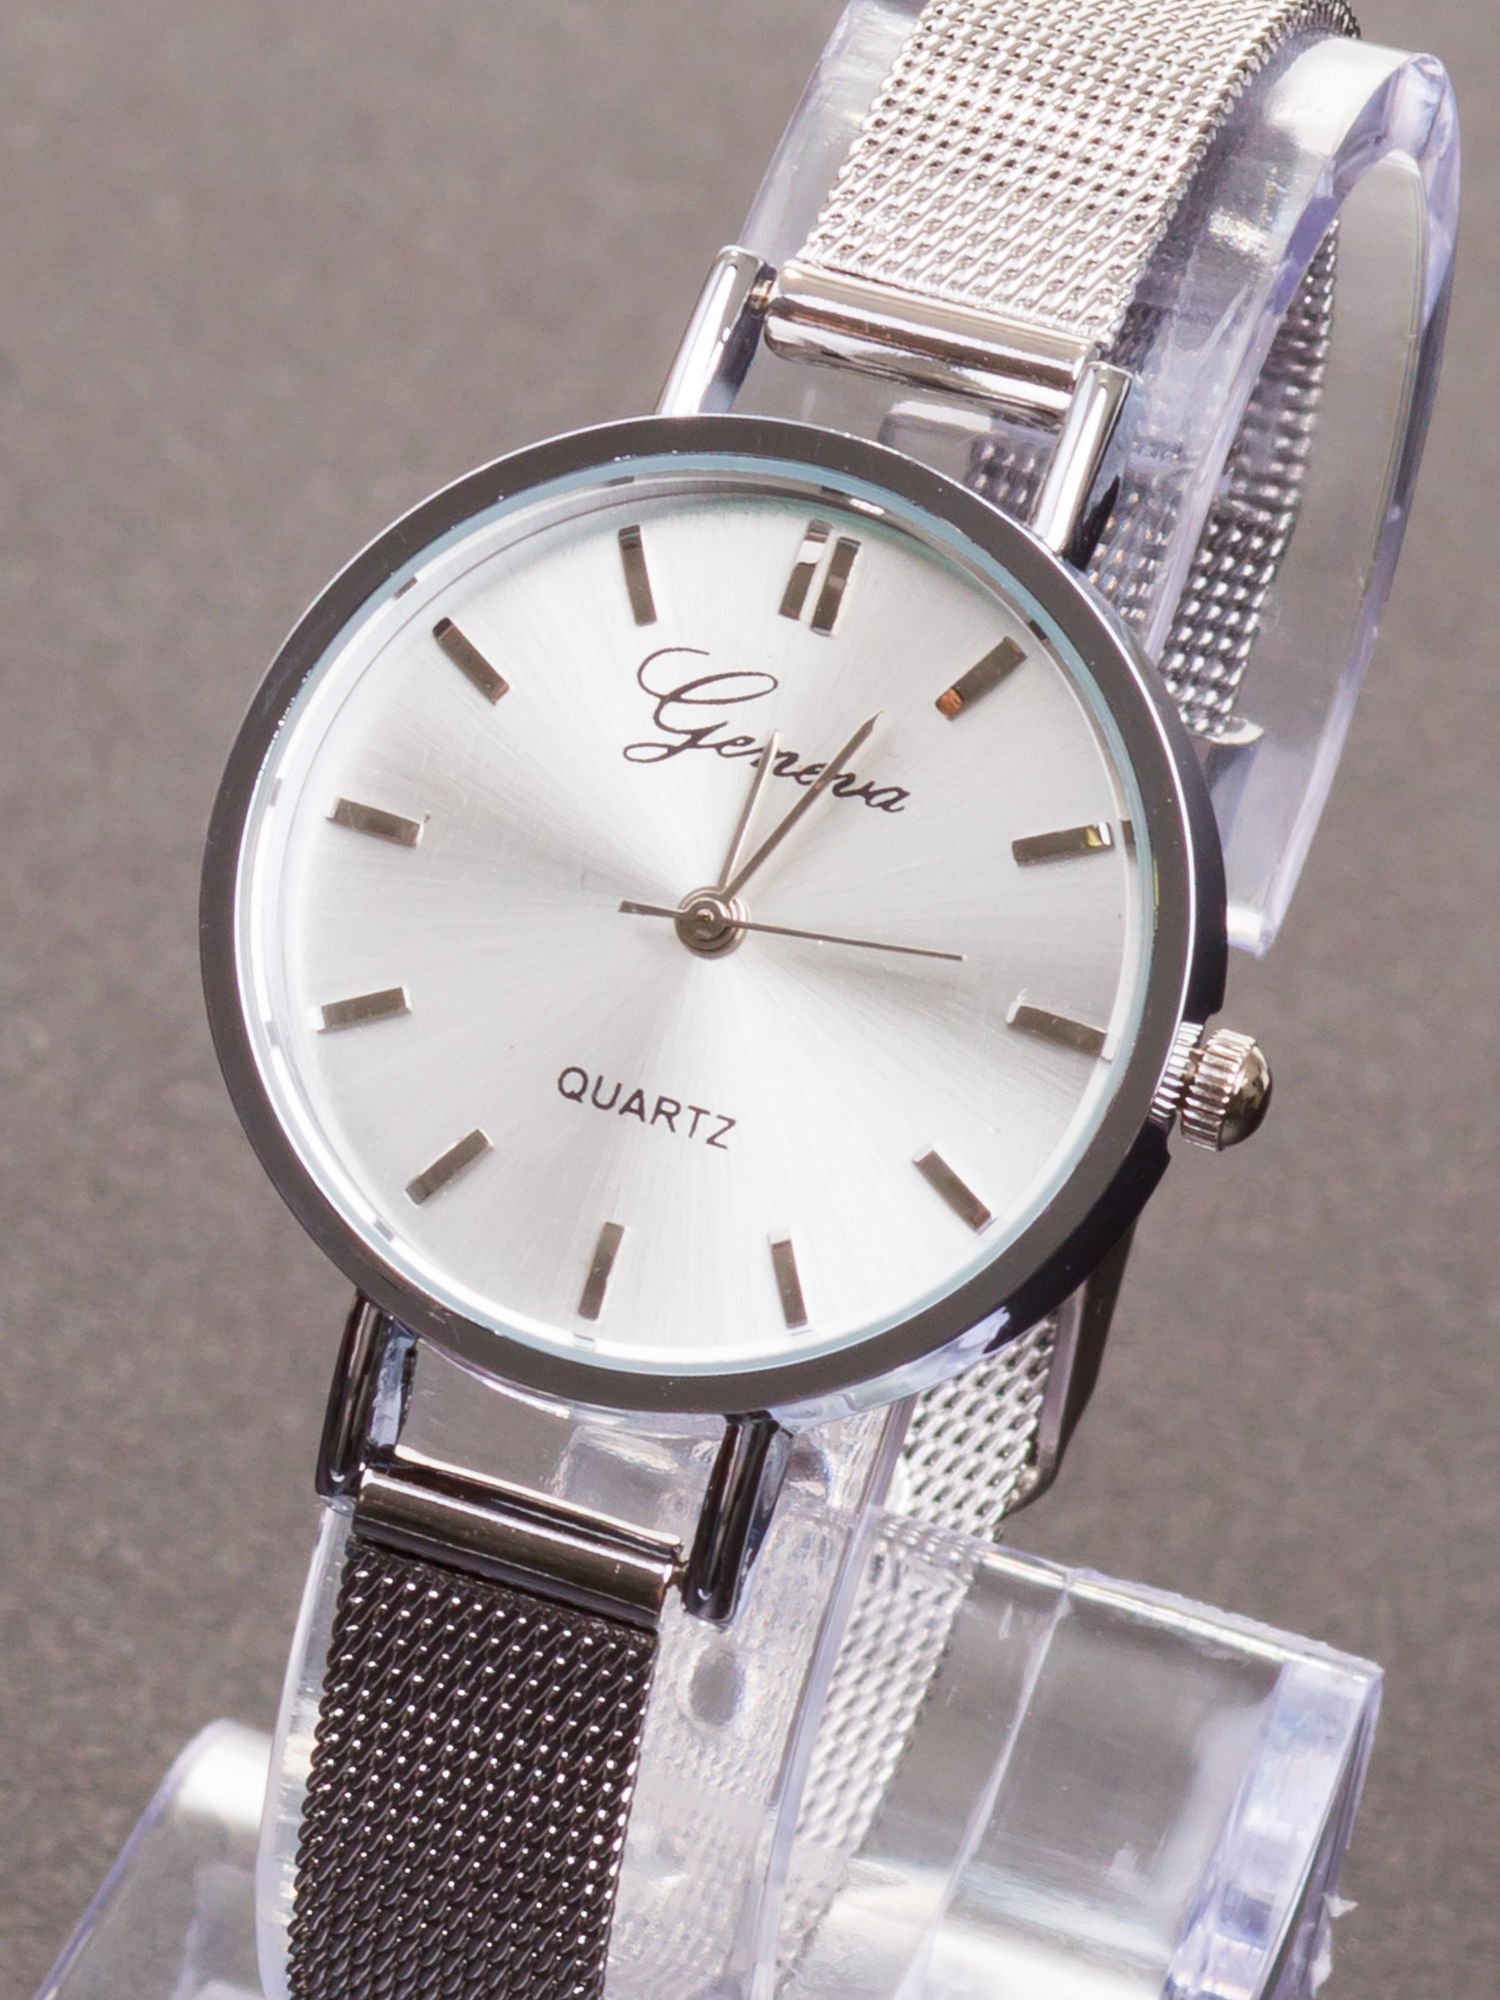 GENEVA Srebrny prosty zegarek damski na bransolecie                                  zdj.                                  3